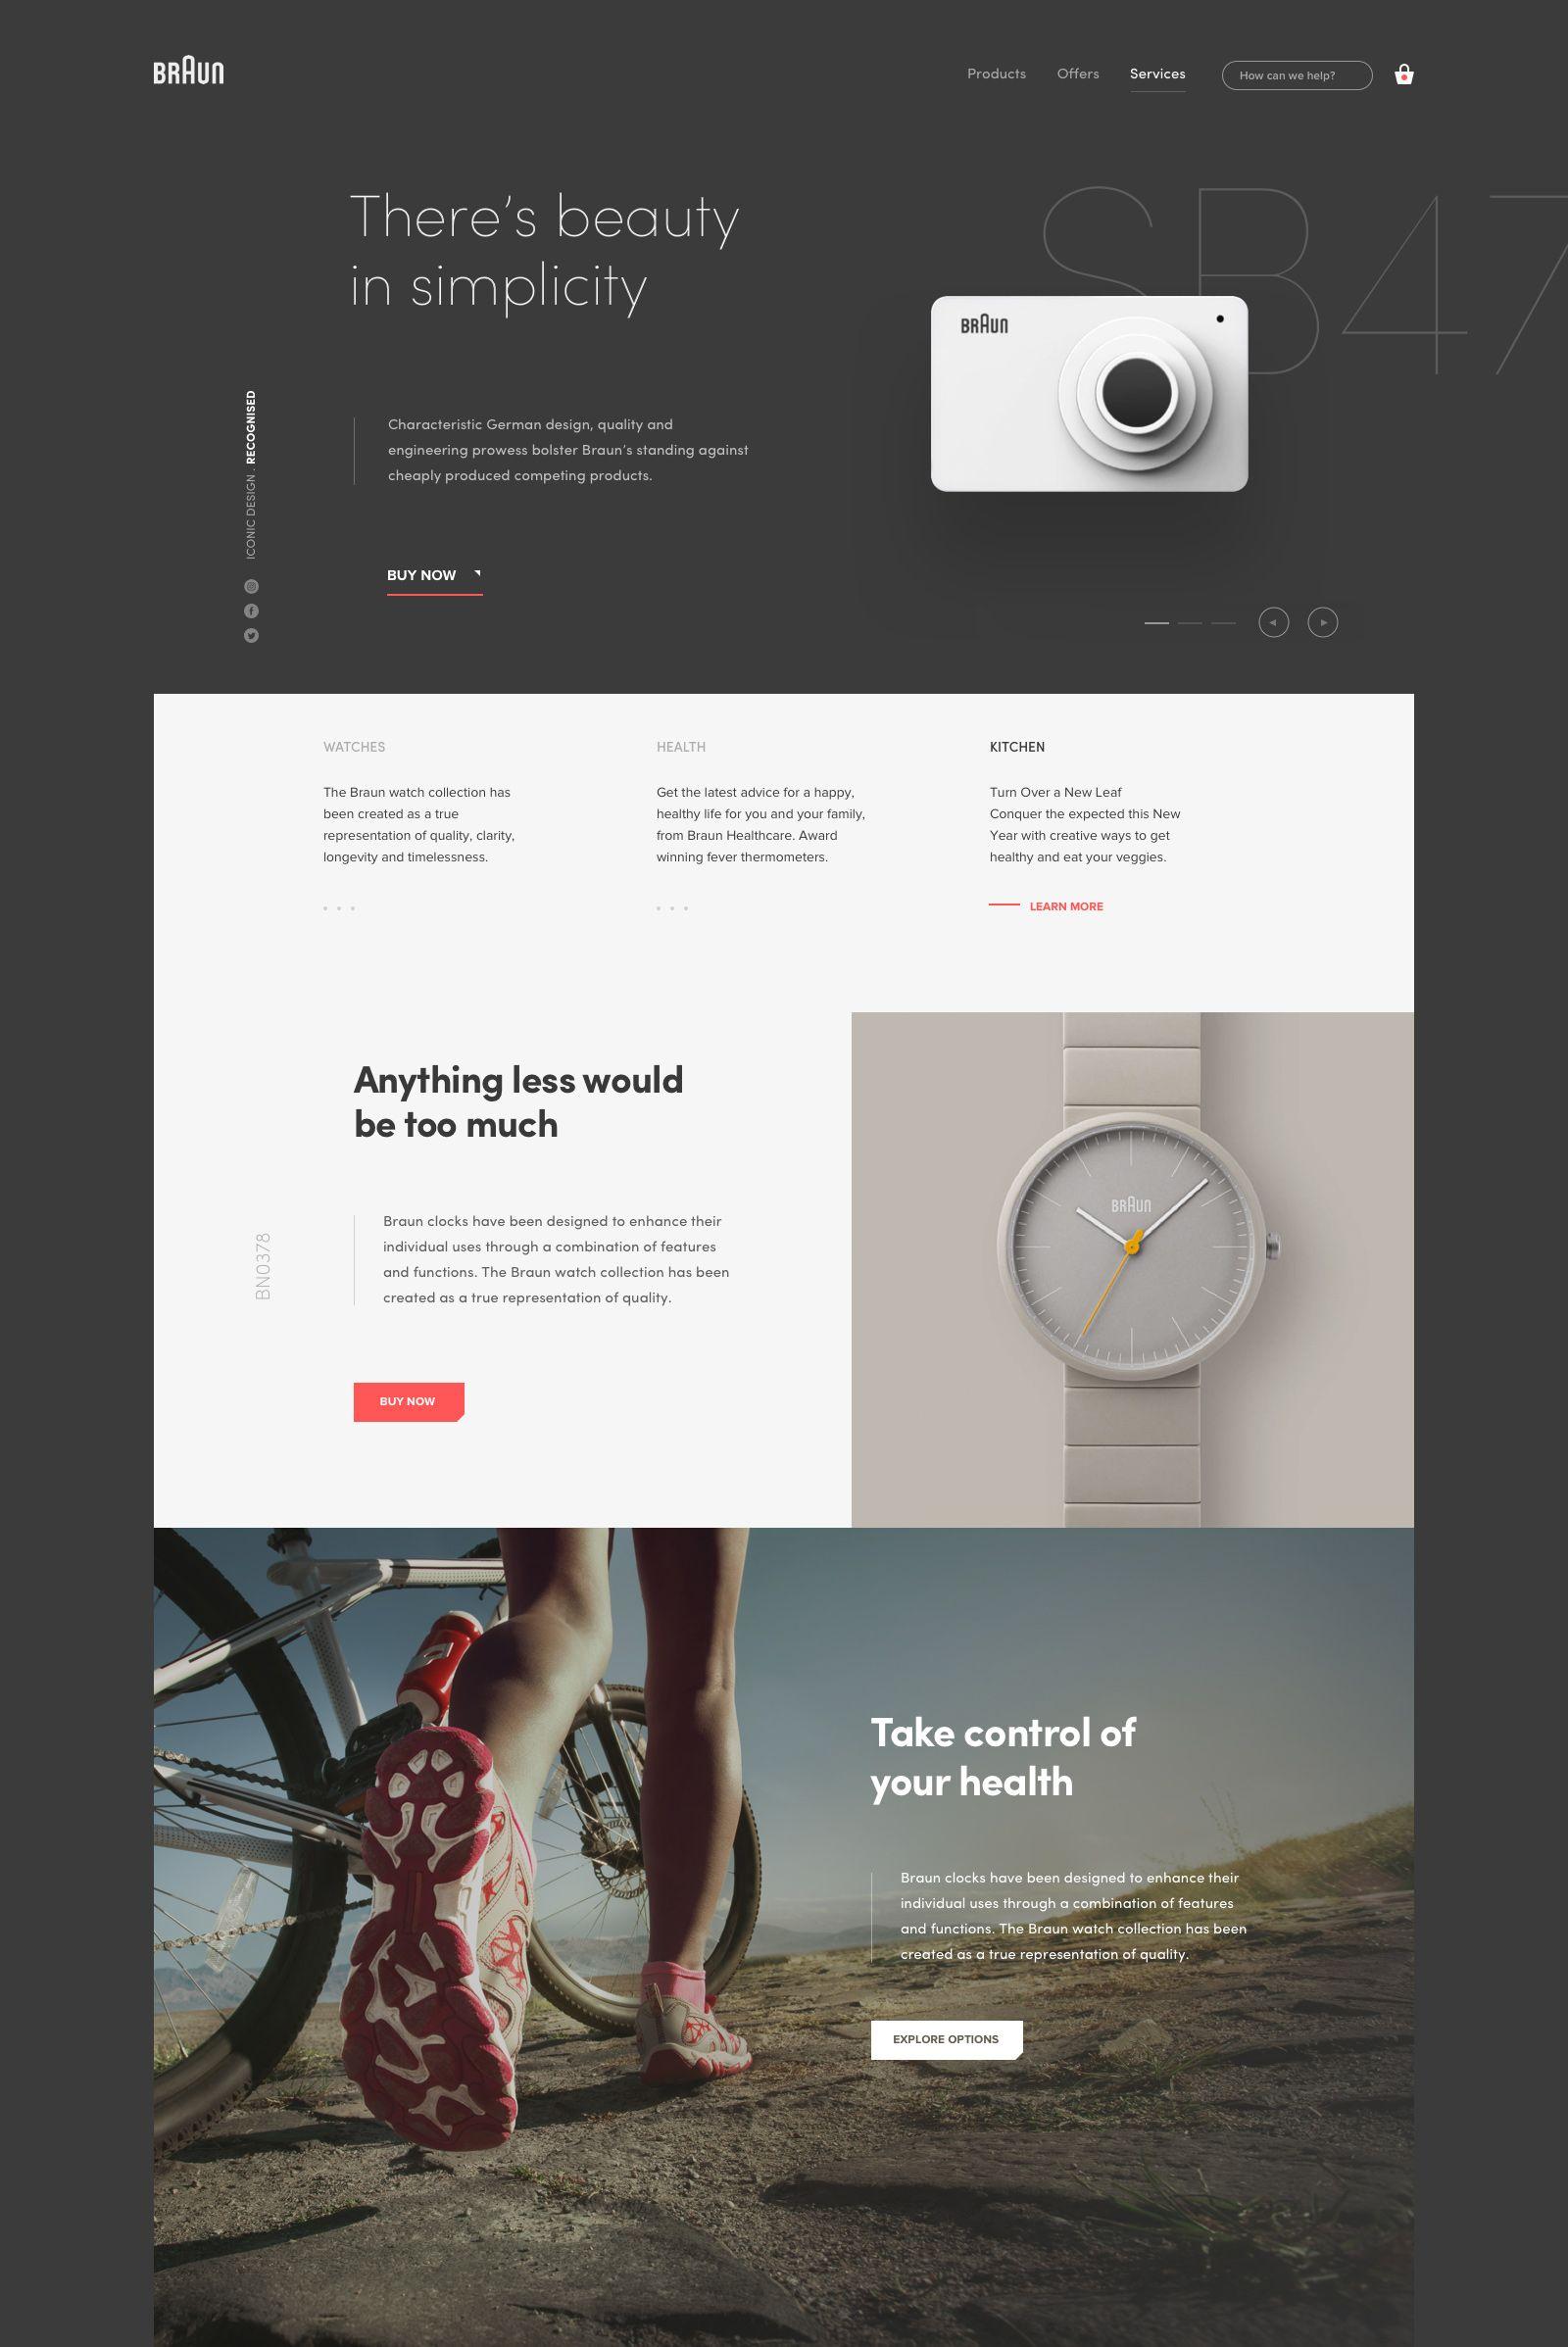 Pin By Milan Spasic On Web Design In 2020 Website Design Layout Quality Web Design Web Design